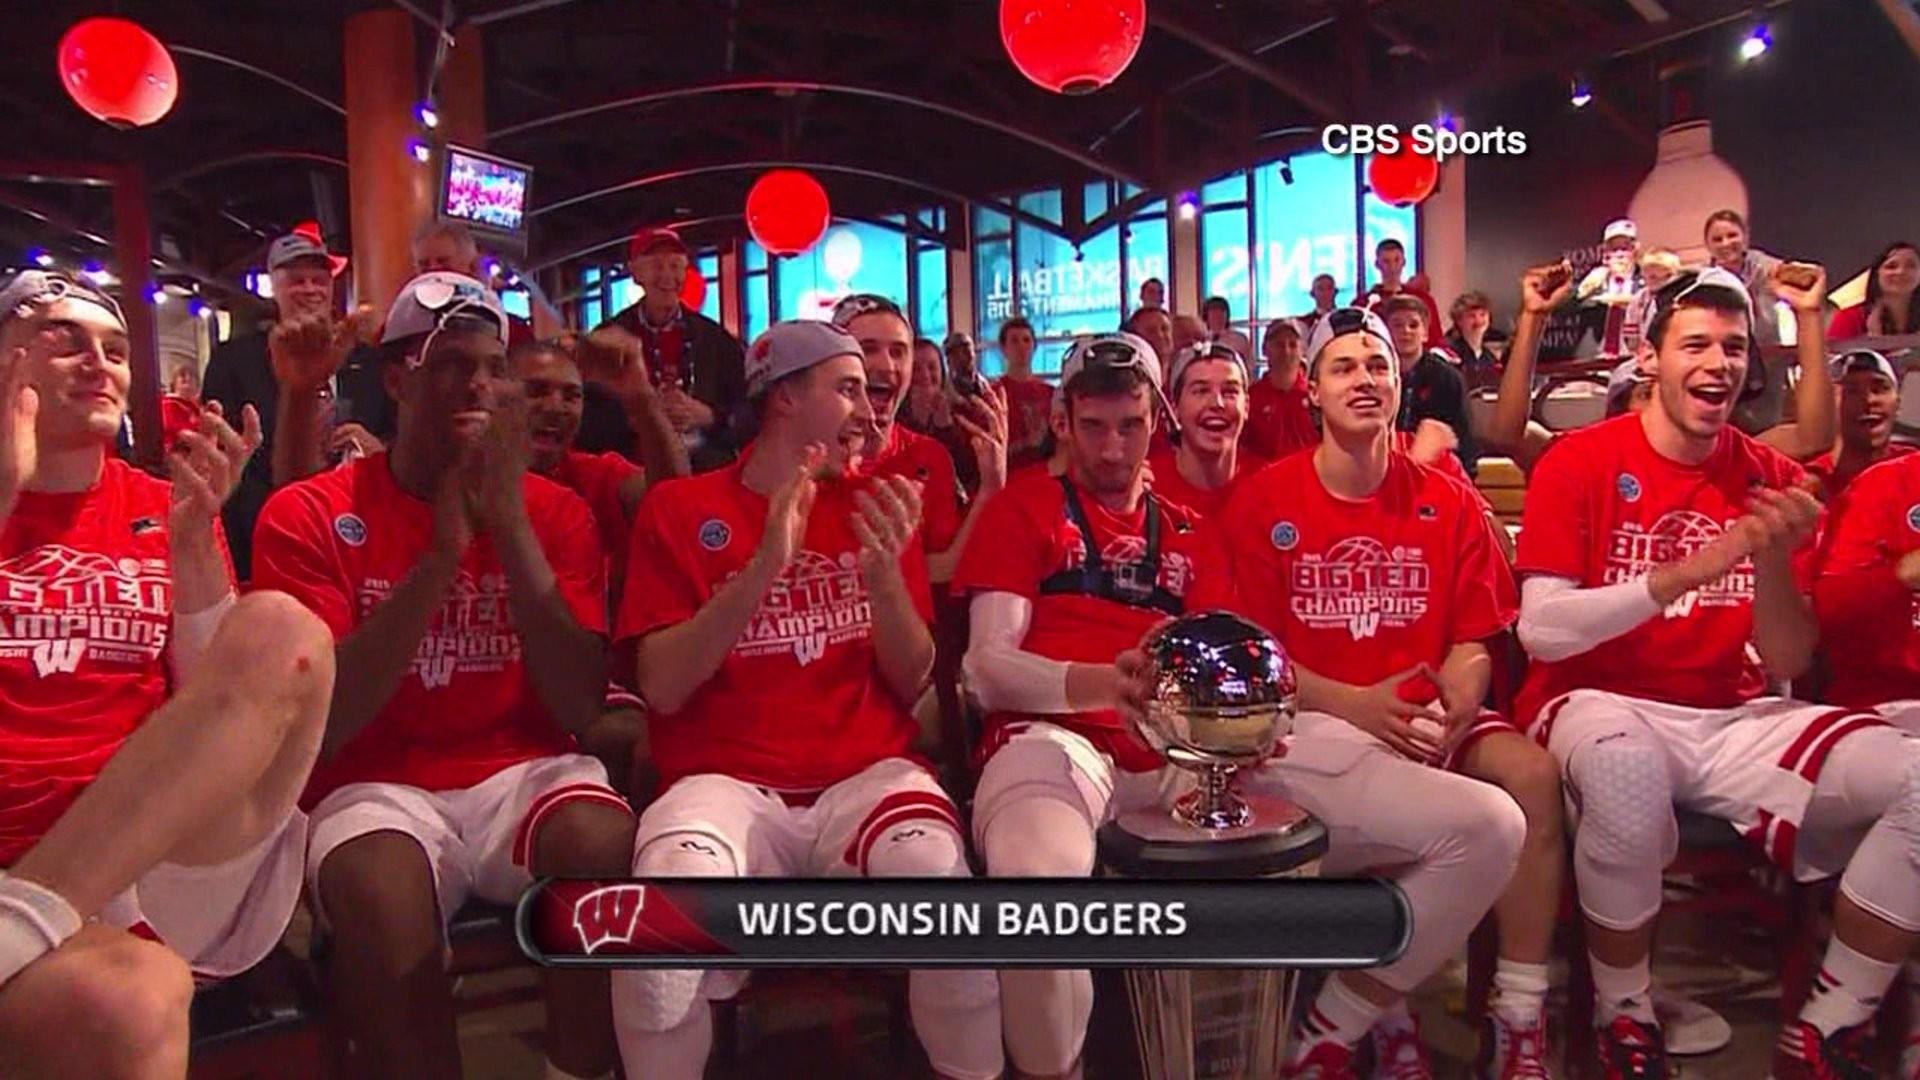 Wisconsin Badgers #1 seed NCAA Tournament